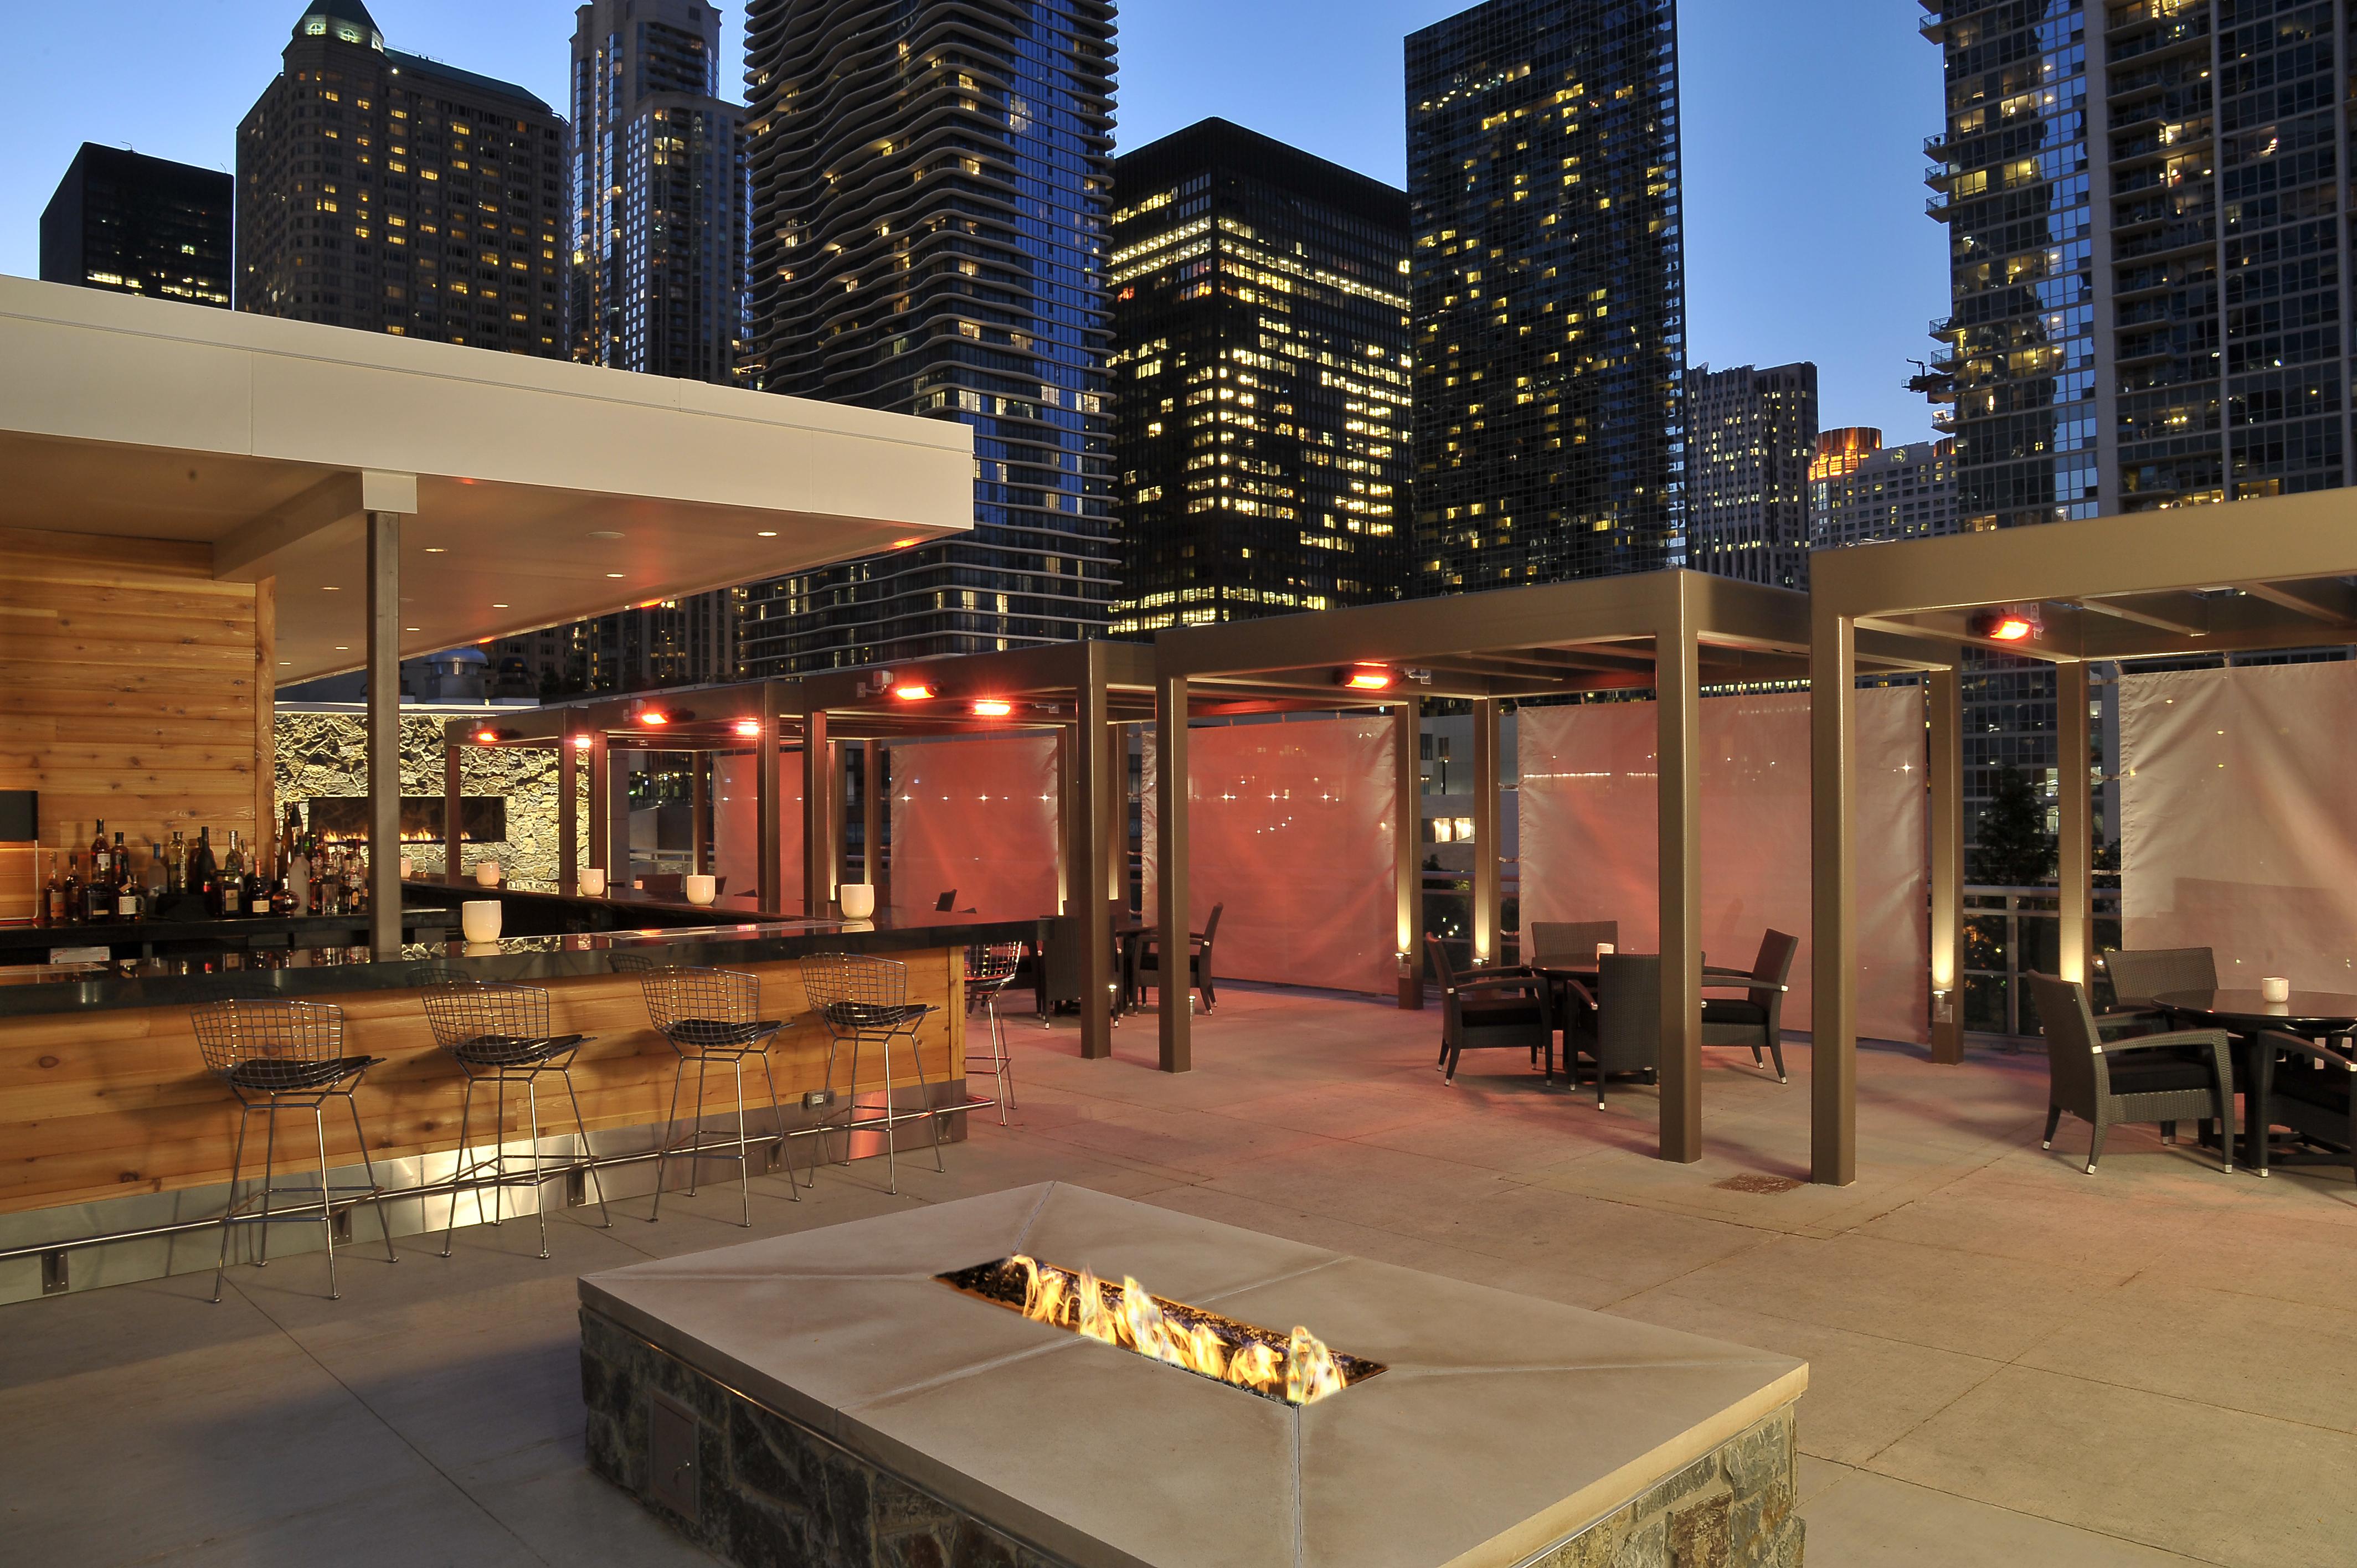 Chicago Top Rooftop Restaurants - Chicago Gen X - Chicago ...